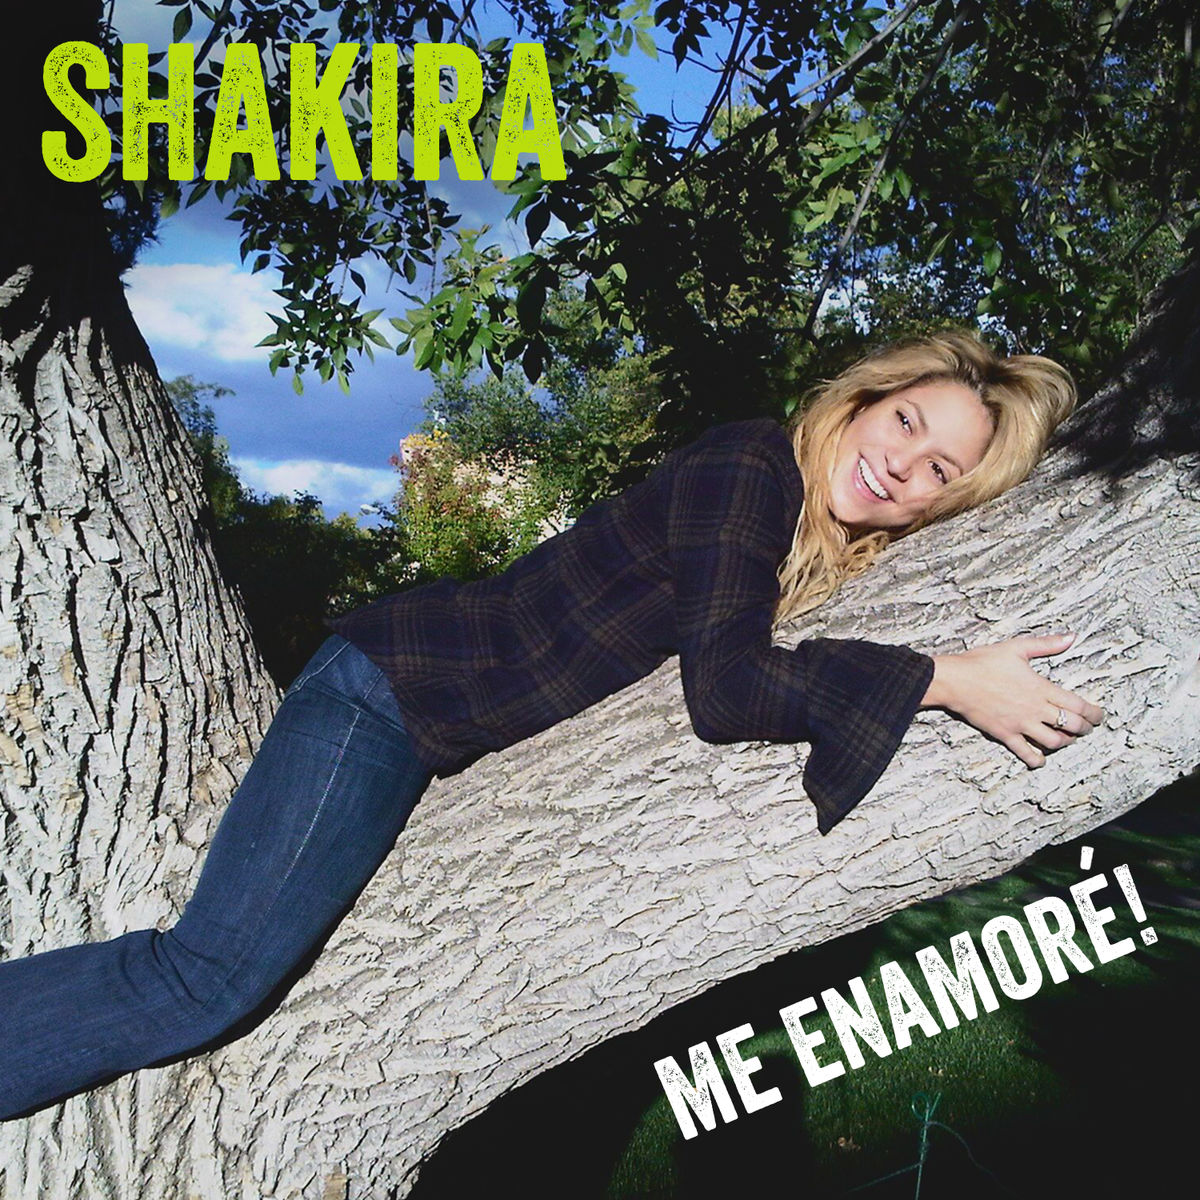 PIES BAIXAR DESCALZOS SHAKIRA CD